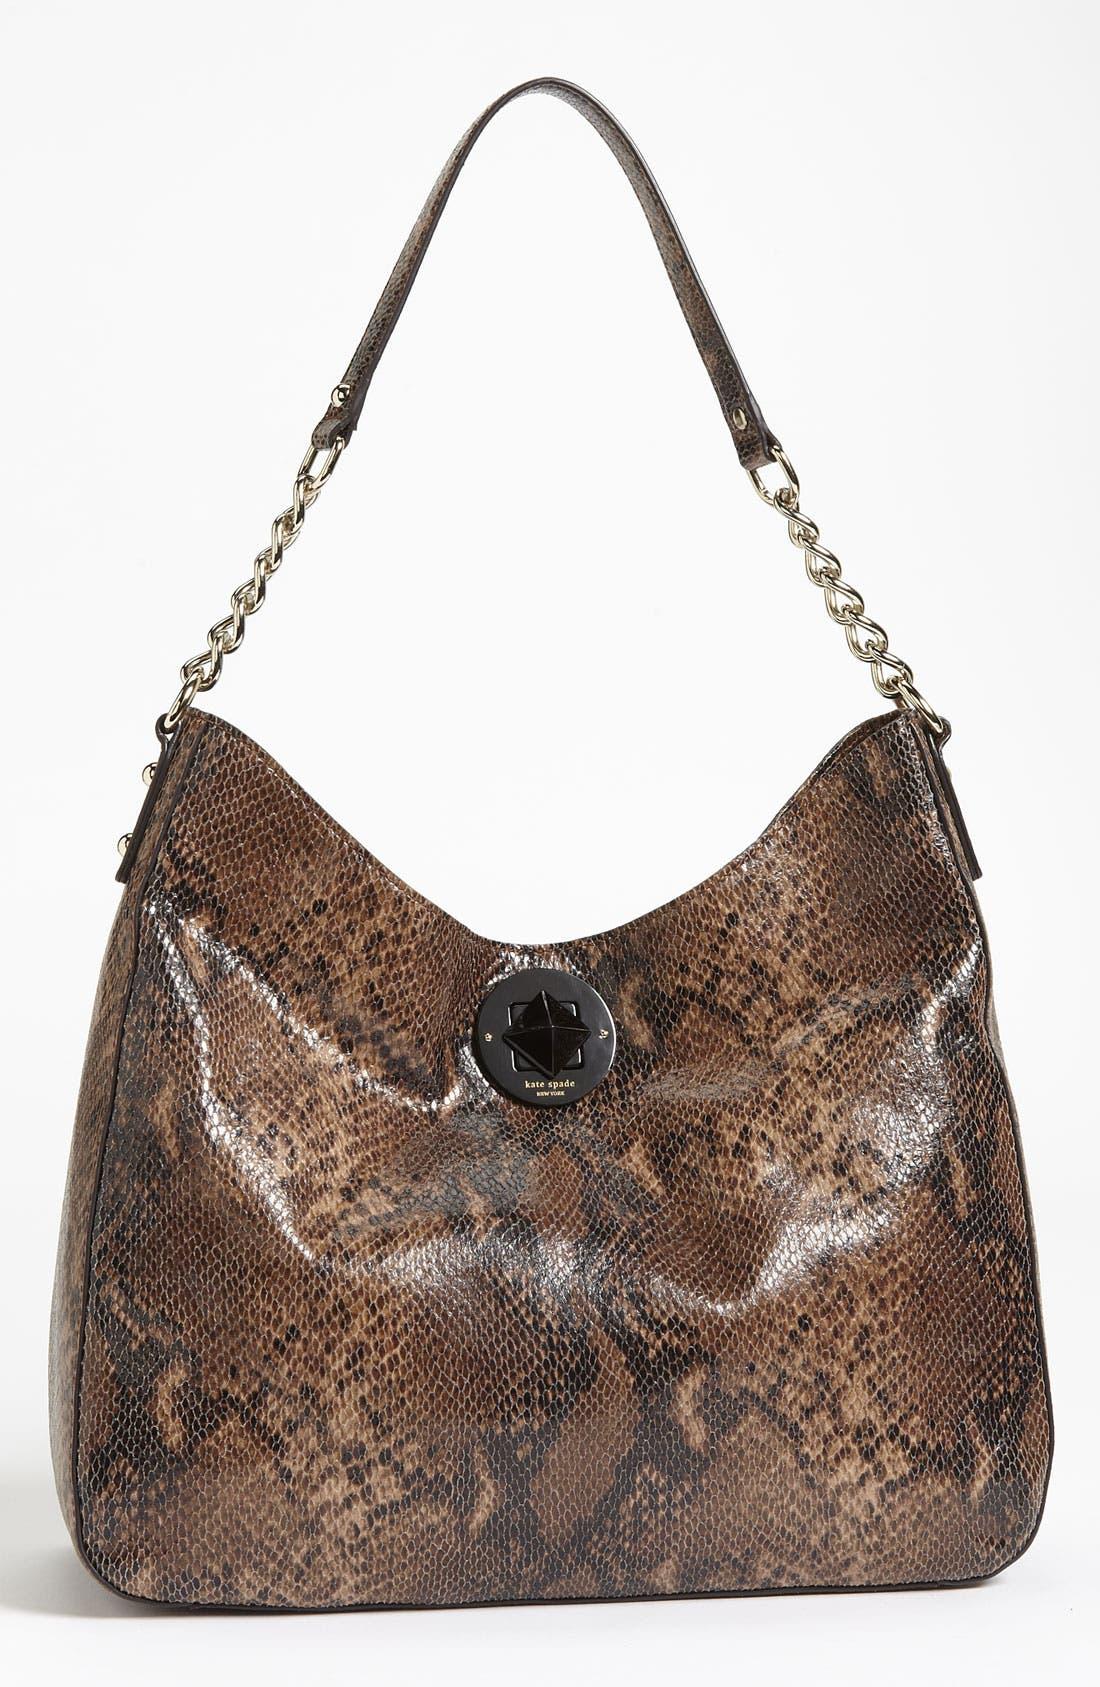 Main Image - kate spade new york 'south kensington - janica' shoulder bag